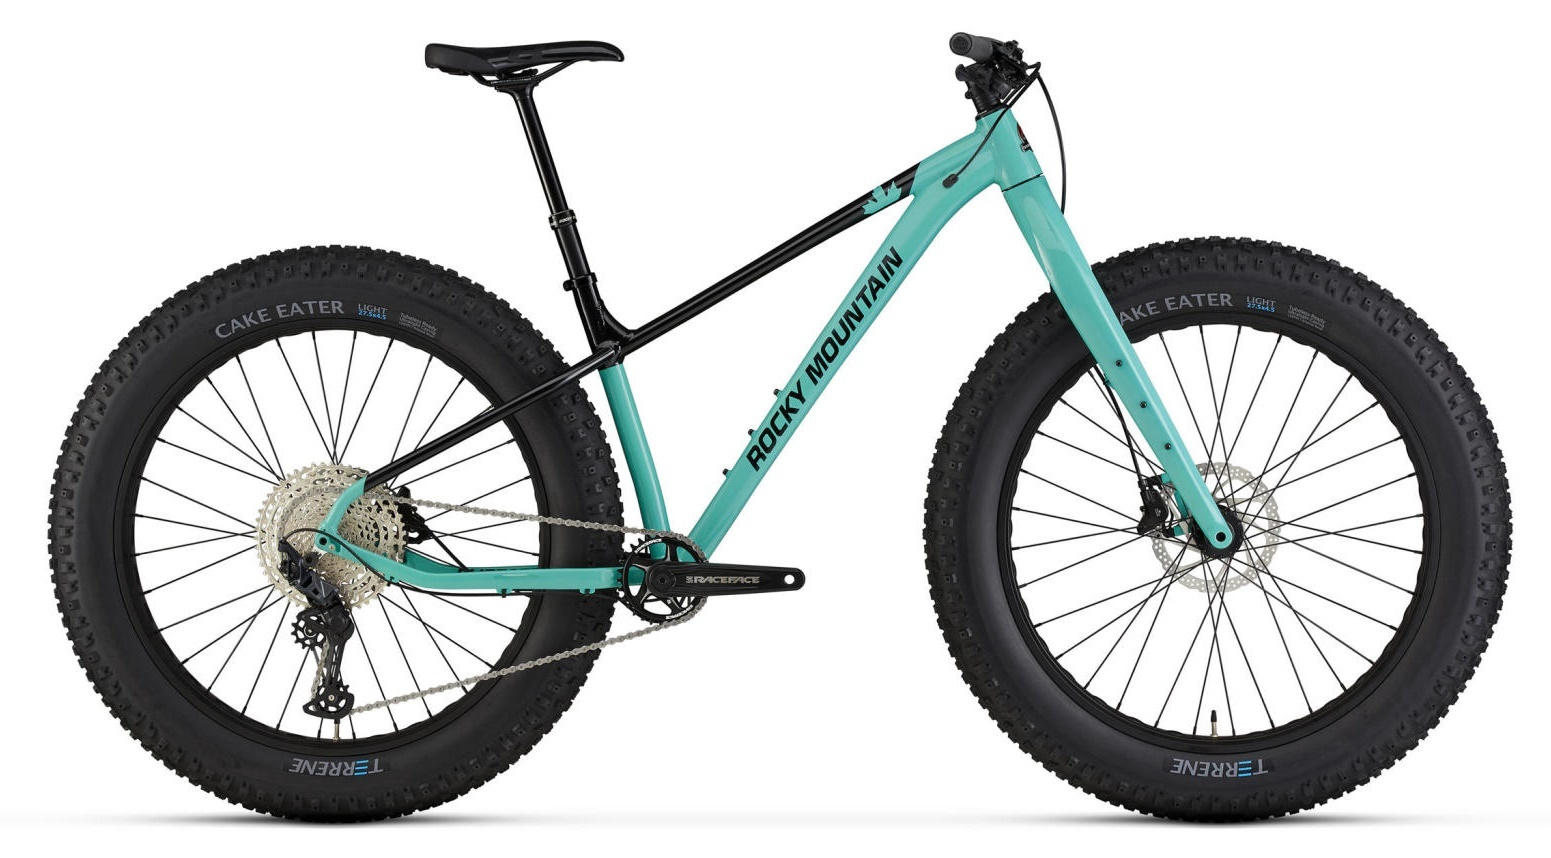 Rocky Mountain Blizzard 30 Fatbike 2021 Turquoise/Black